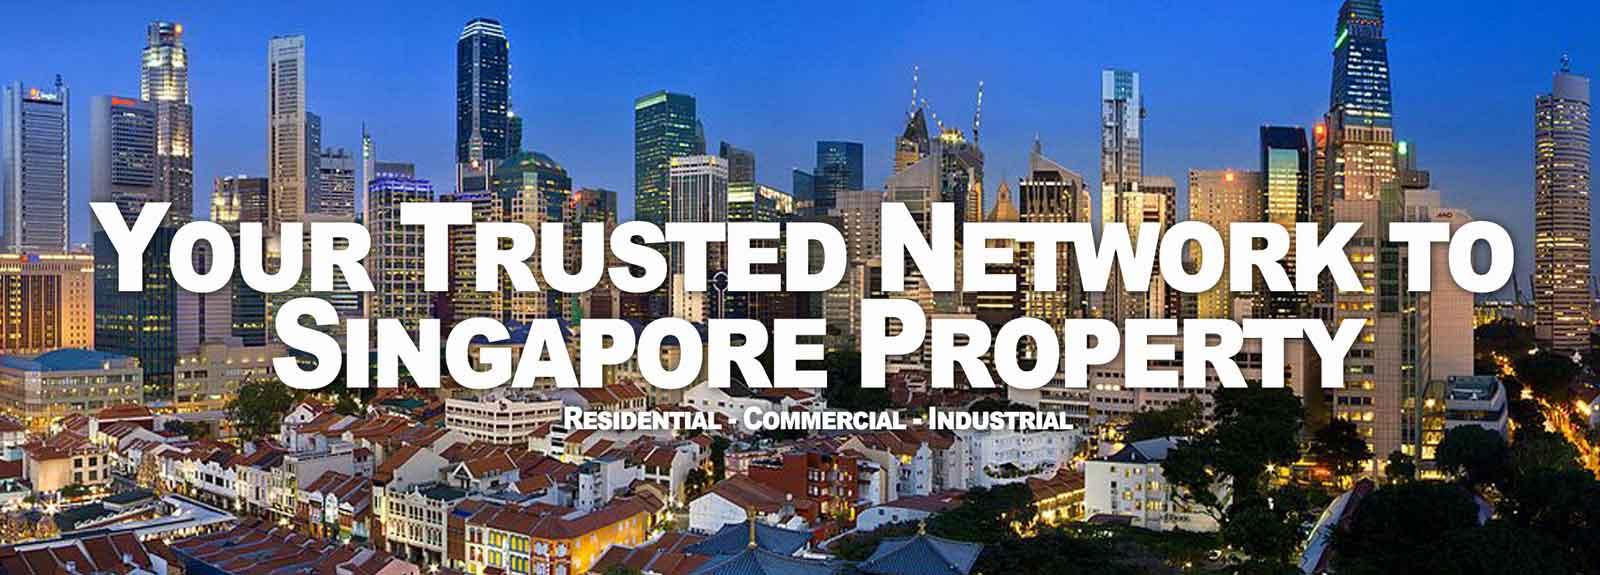 Singapore Property